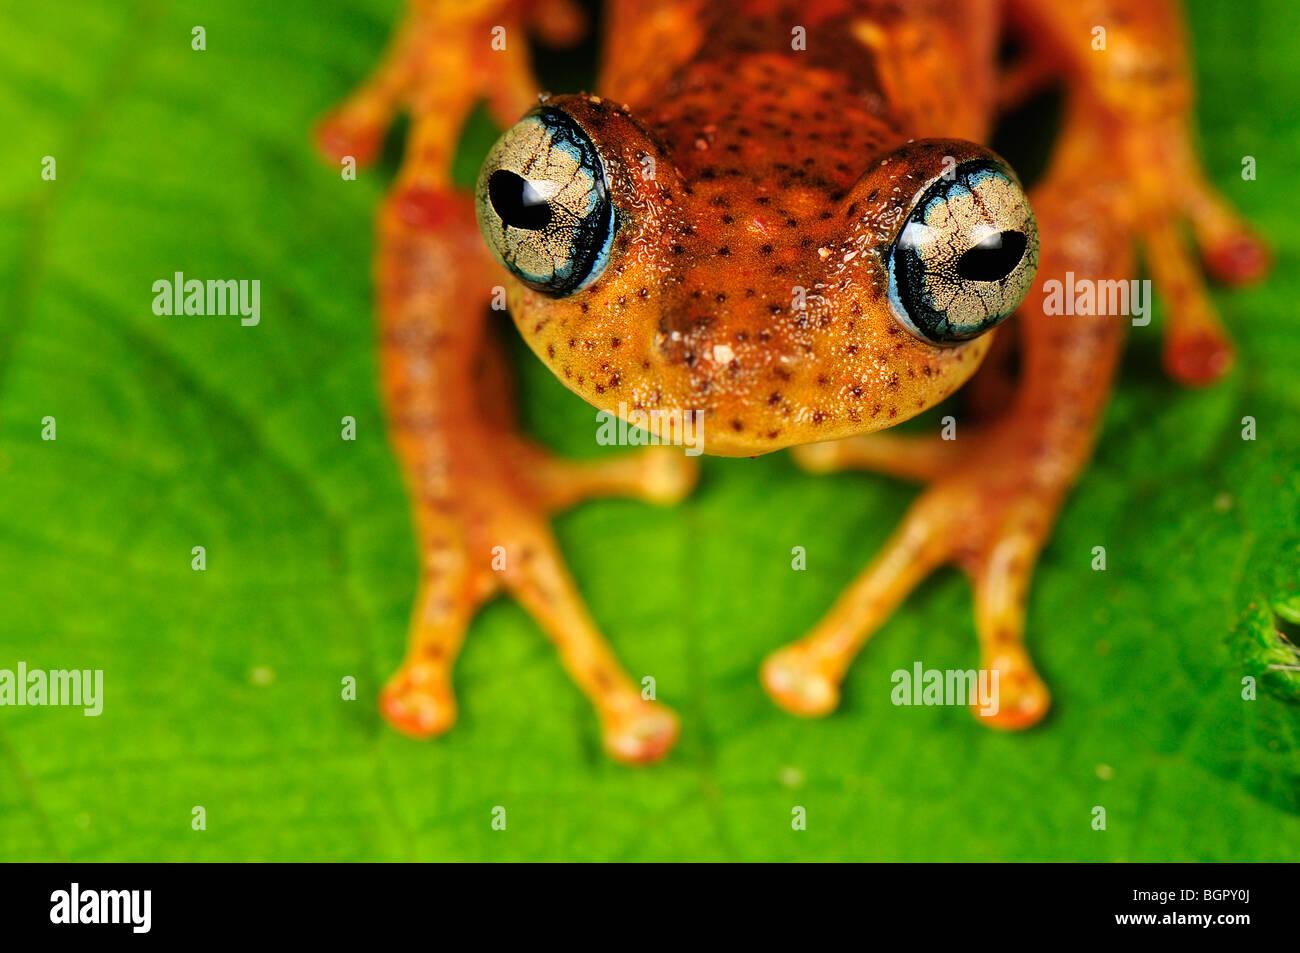 Raganella (Boophis tephraeomystax) (Boophis difficilis}, adulto, Andasibe-Mantadia Parco nazionale del Madagascar Immagini Stock